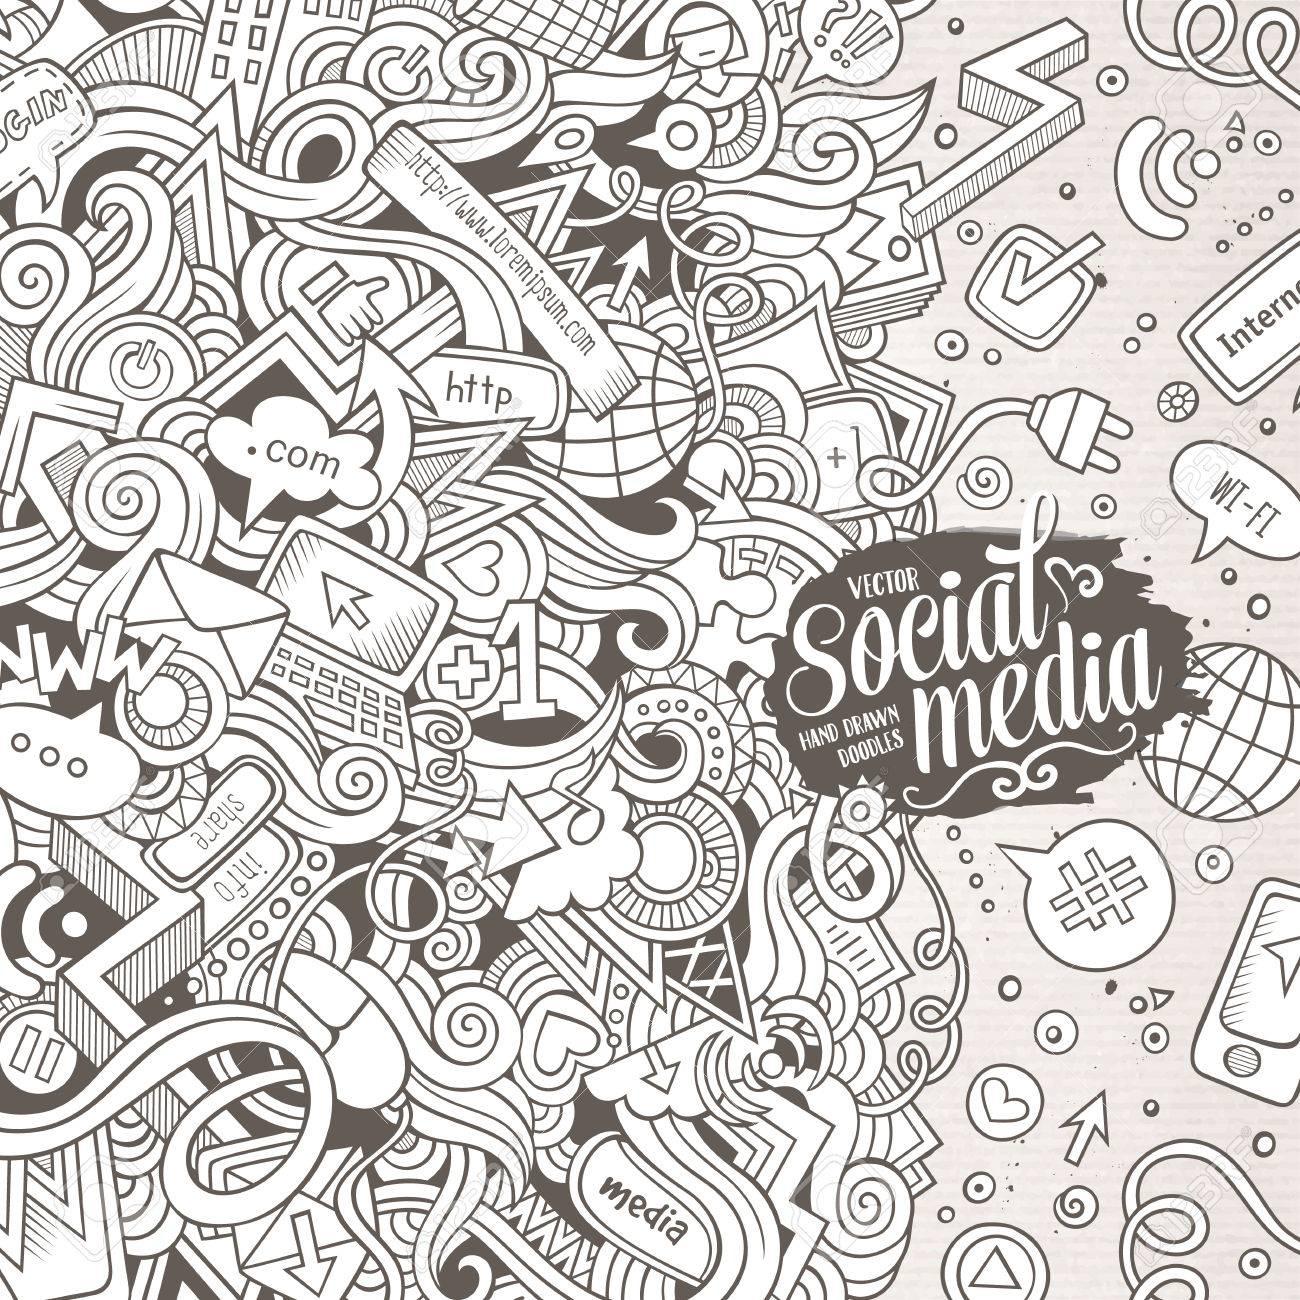 Dessin Anime Mignon Doodles Illustration Internet Dessines A La Main